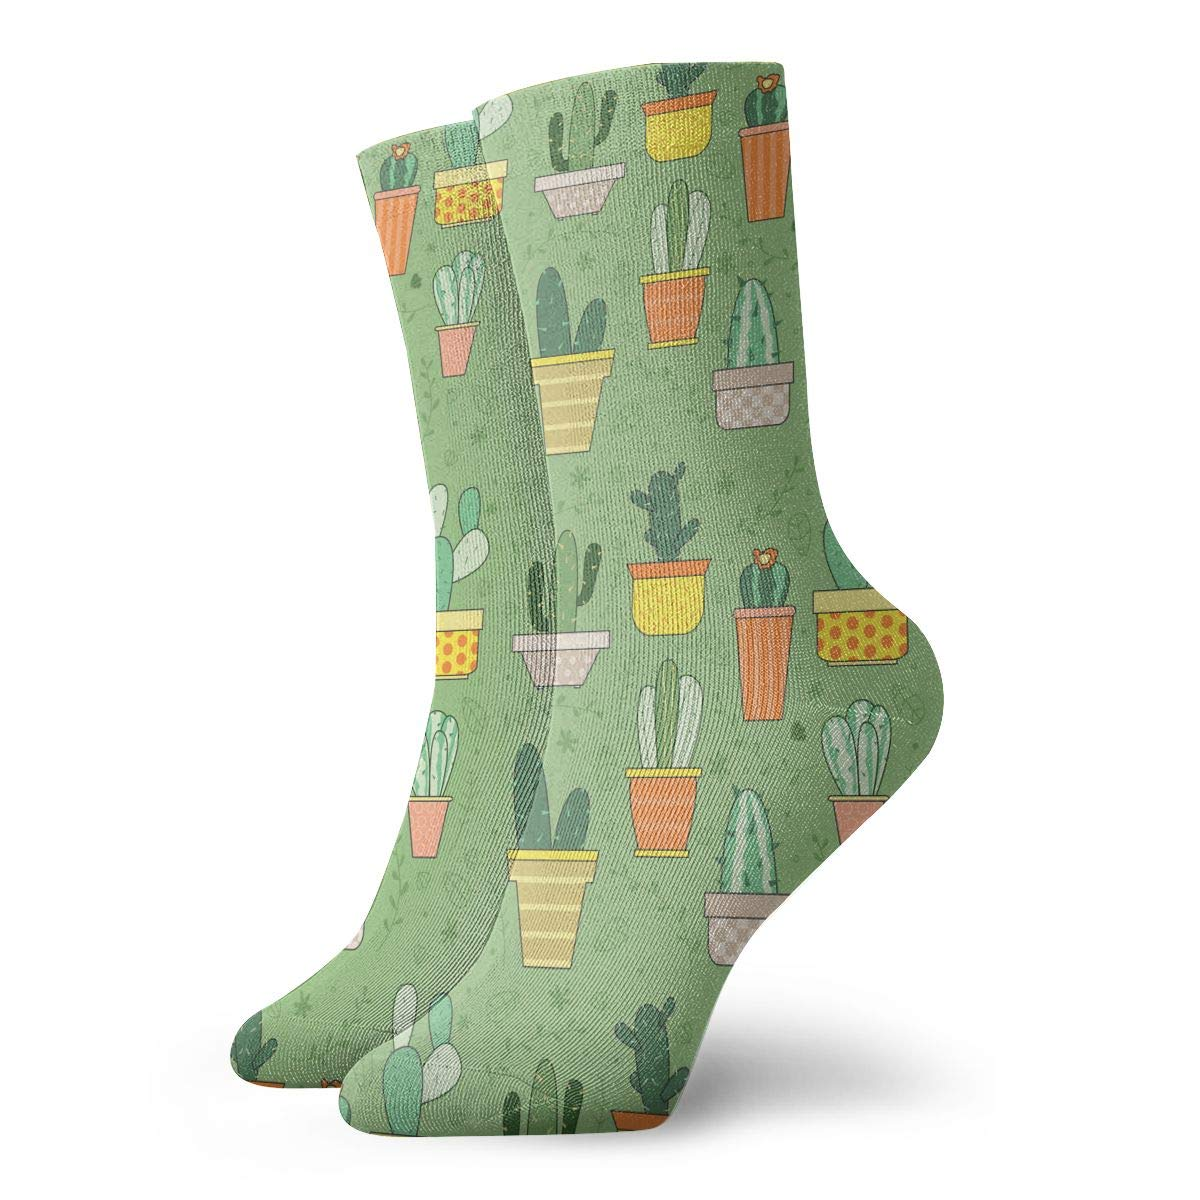 Unisex Cactus Plants Set Athletic Quarter Ankle Print Breathable Hiking Running Socks